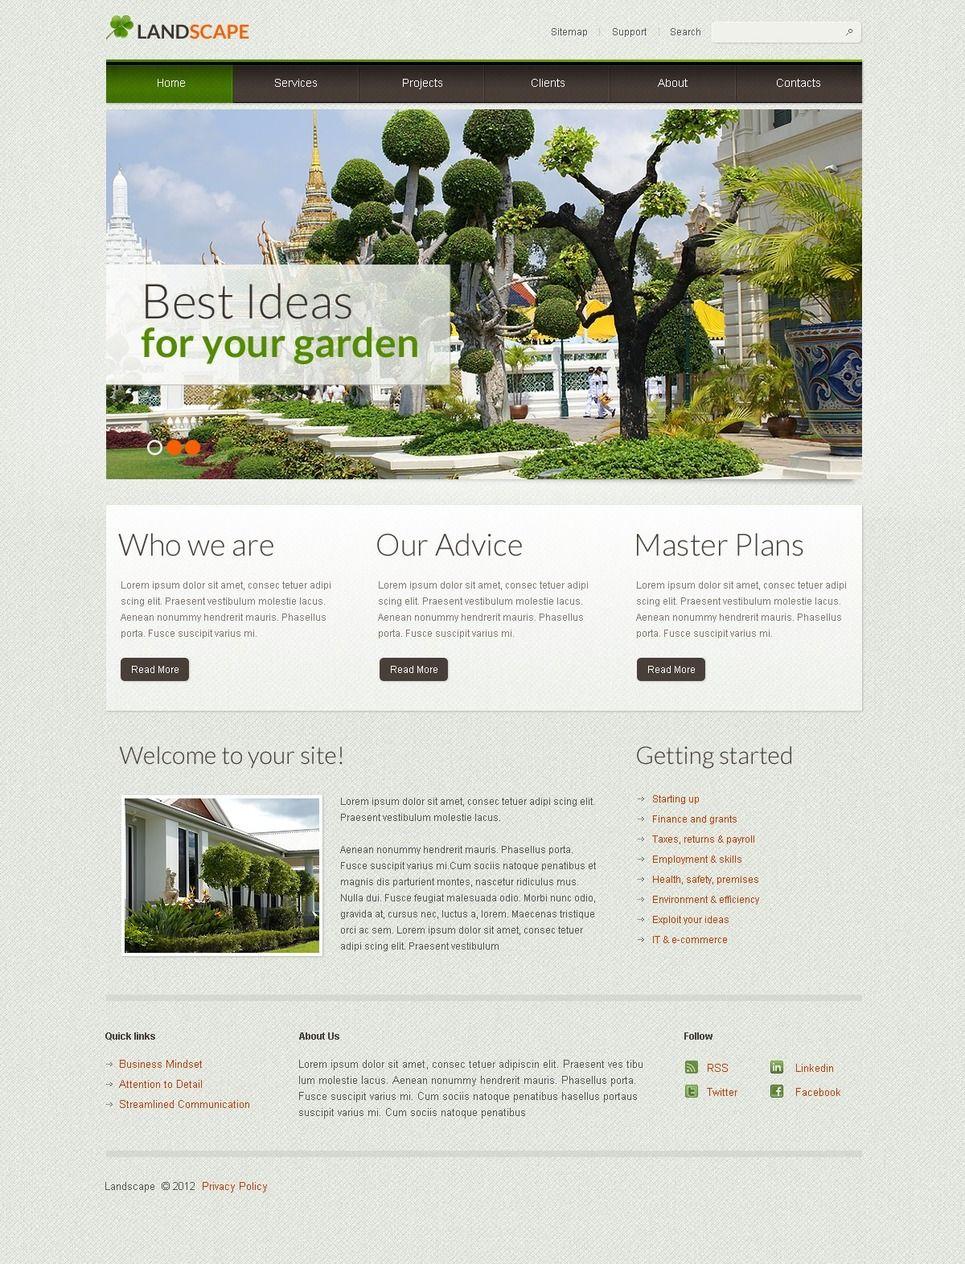 Landscape Design Facebook Html Cms Template 42021 Garden Landscape Design Landscape Design Small Garden Landscape Design